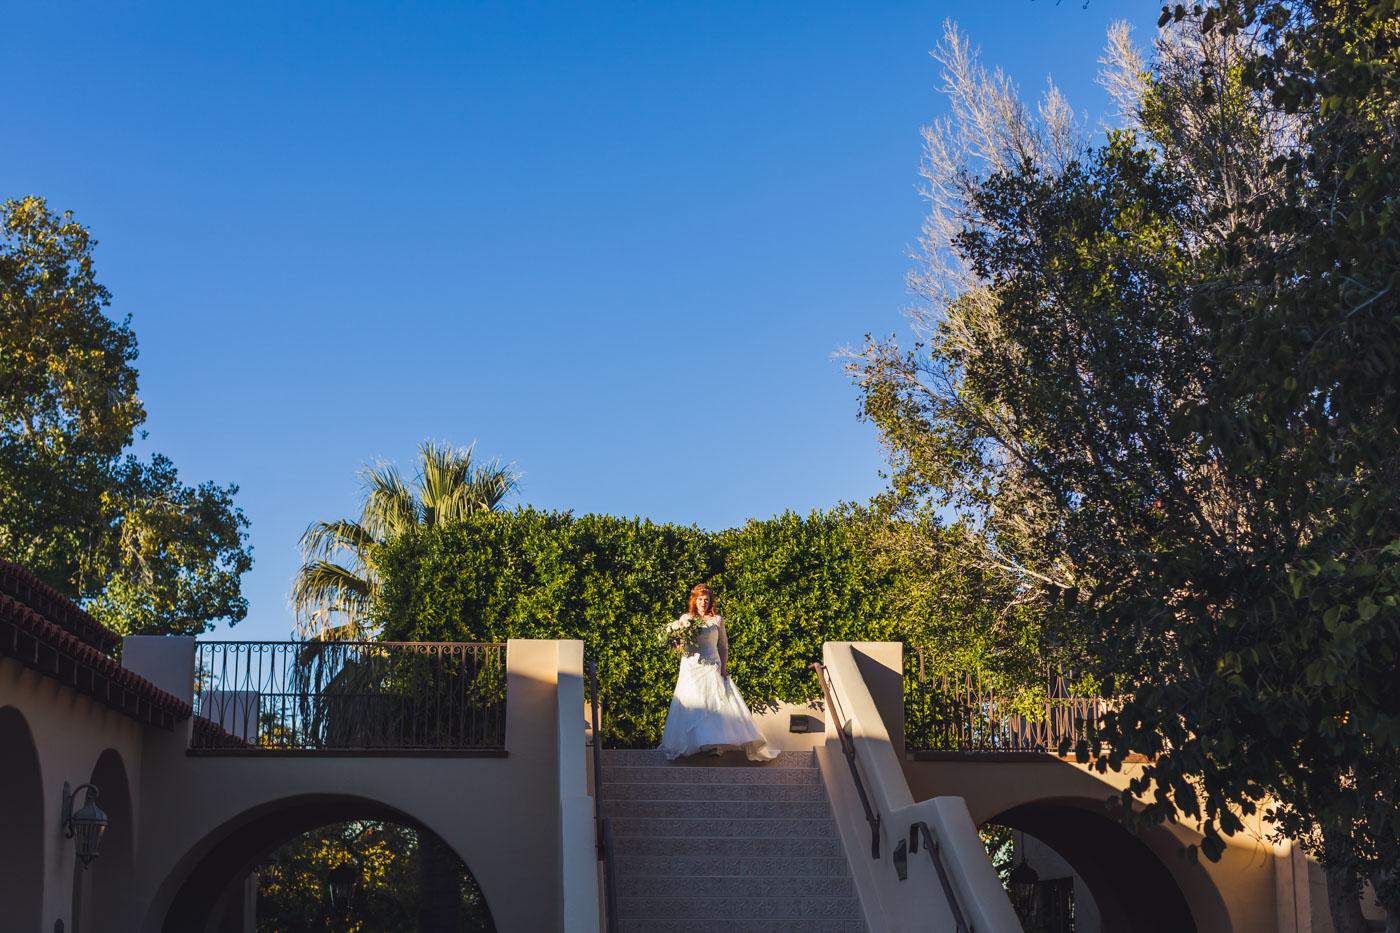 aaron-kes-photography-secret-garden-event-center-wedding-16.jpg